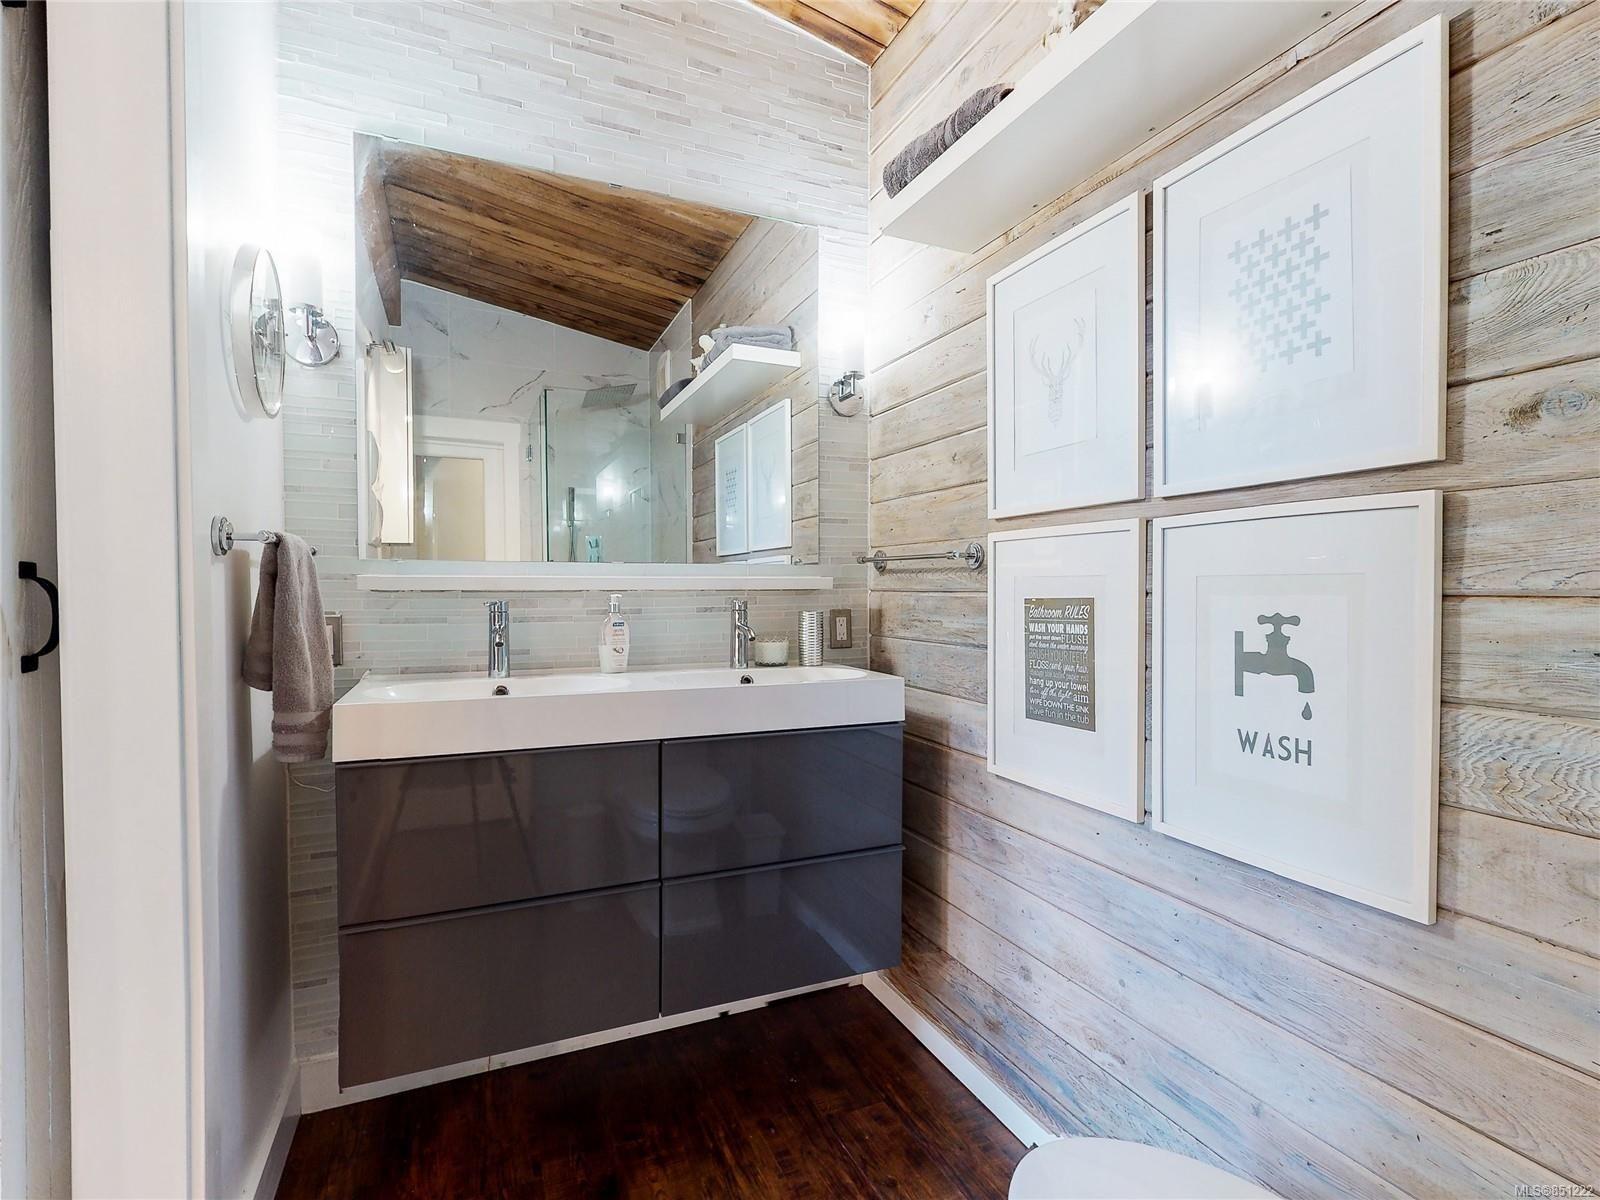 Photo 16: Photos: 2525 11th Ave in : PA Port Alberni House for sale (Port Alberni)  : MLS®# 851222